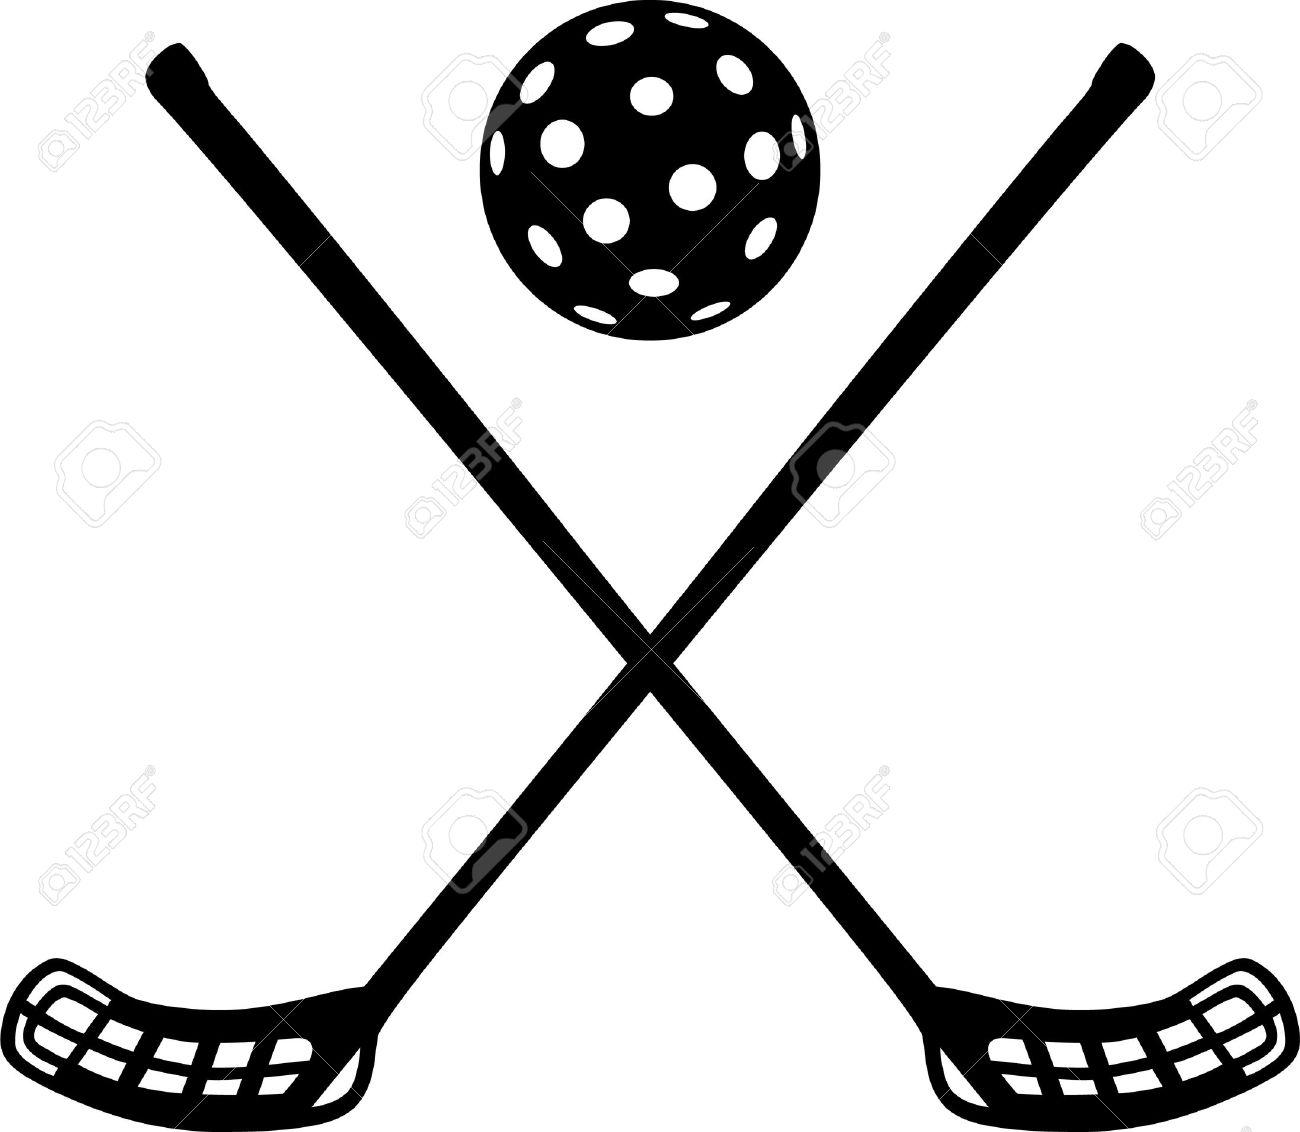 Floorball sticks with ball - 44786554